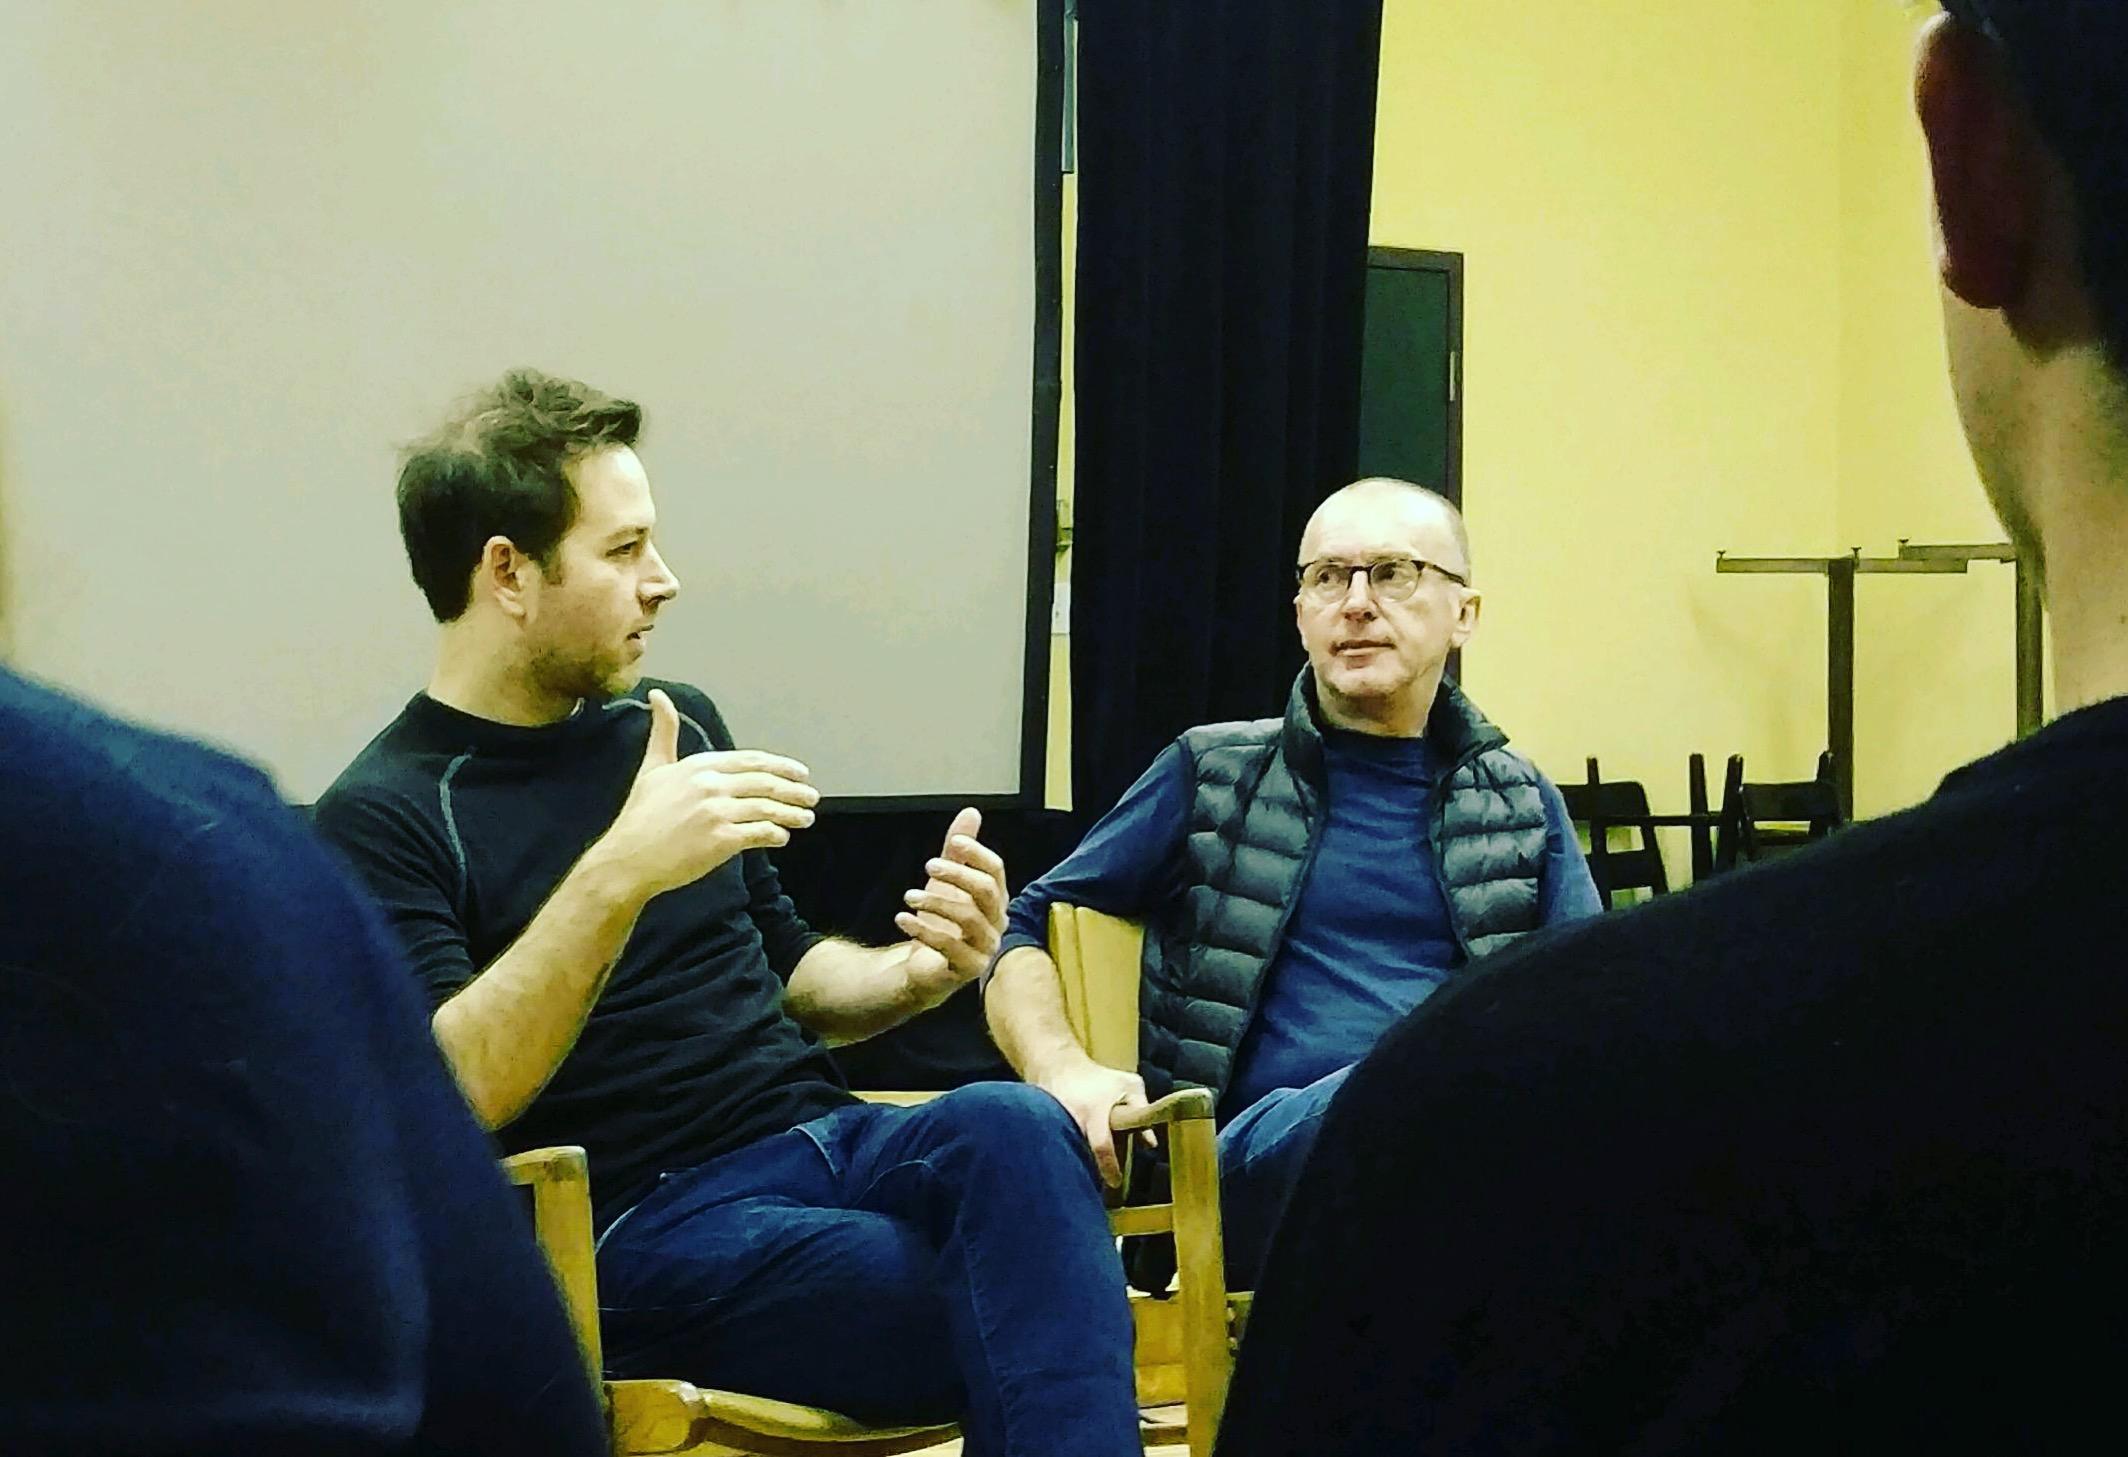 Daniel Pettrow and Pedja Muzijevic